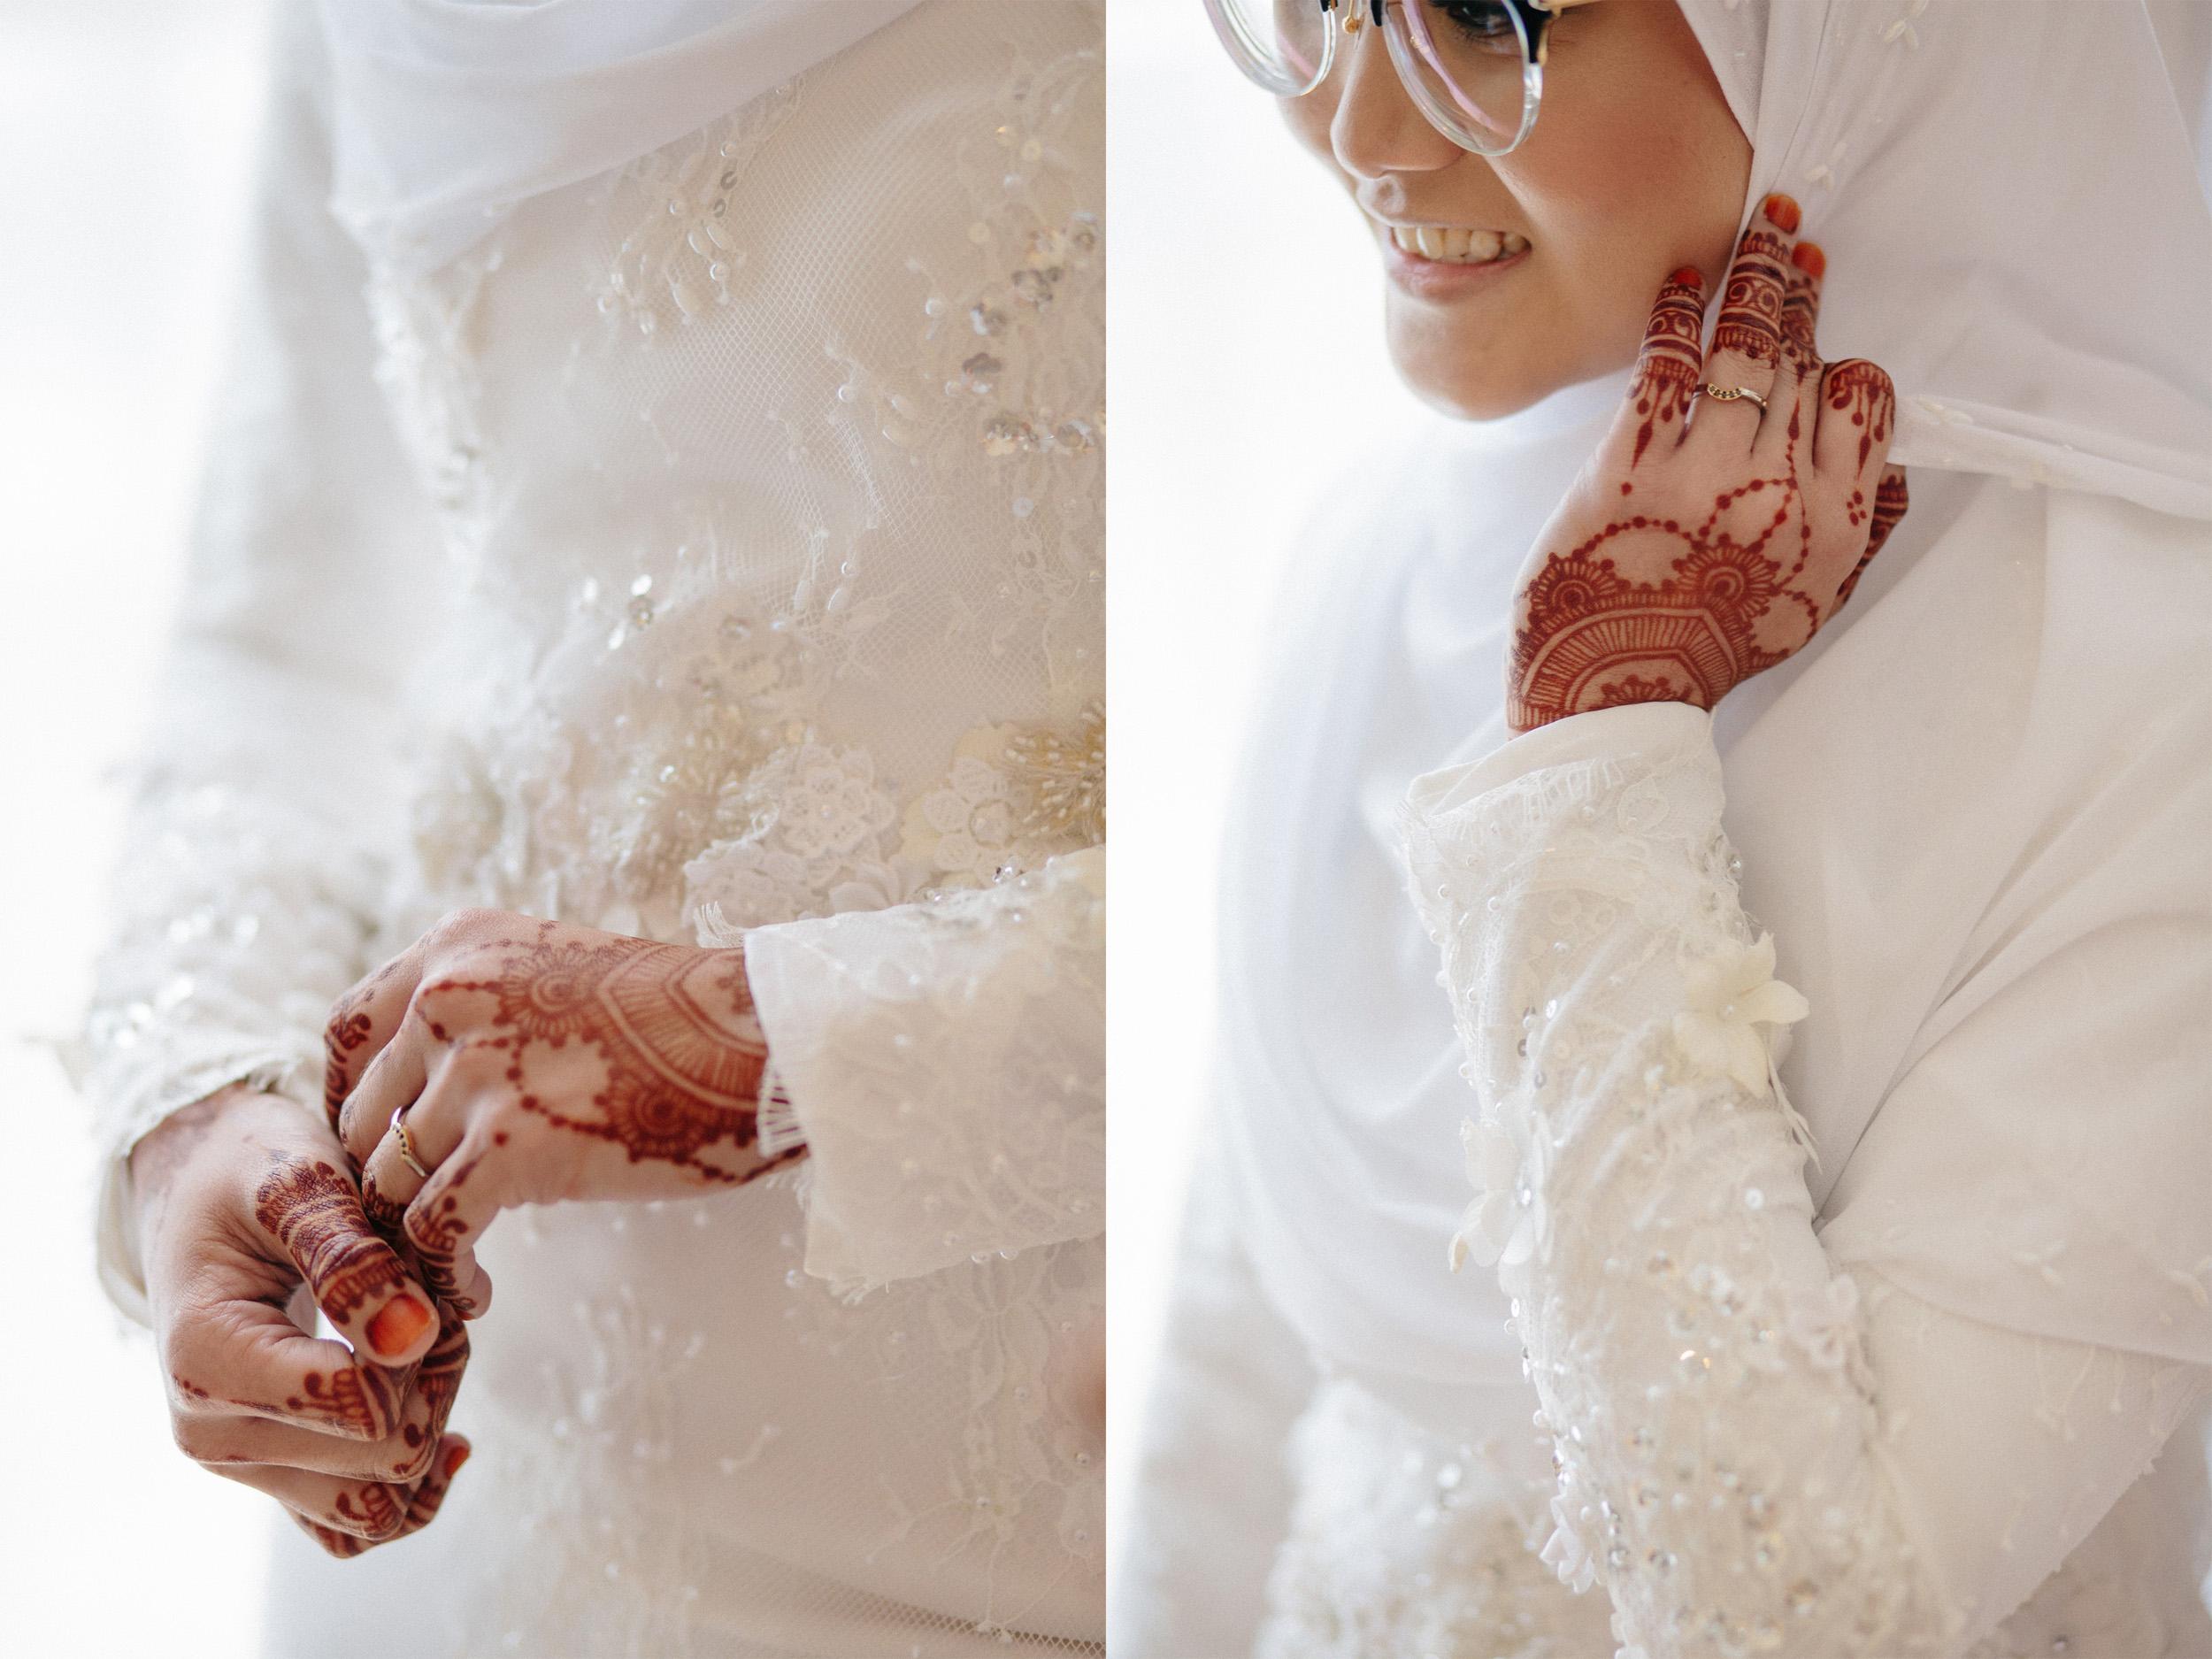 singapore-wedding-photographer-photography-wmt2017-144.jpg